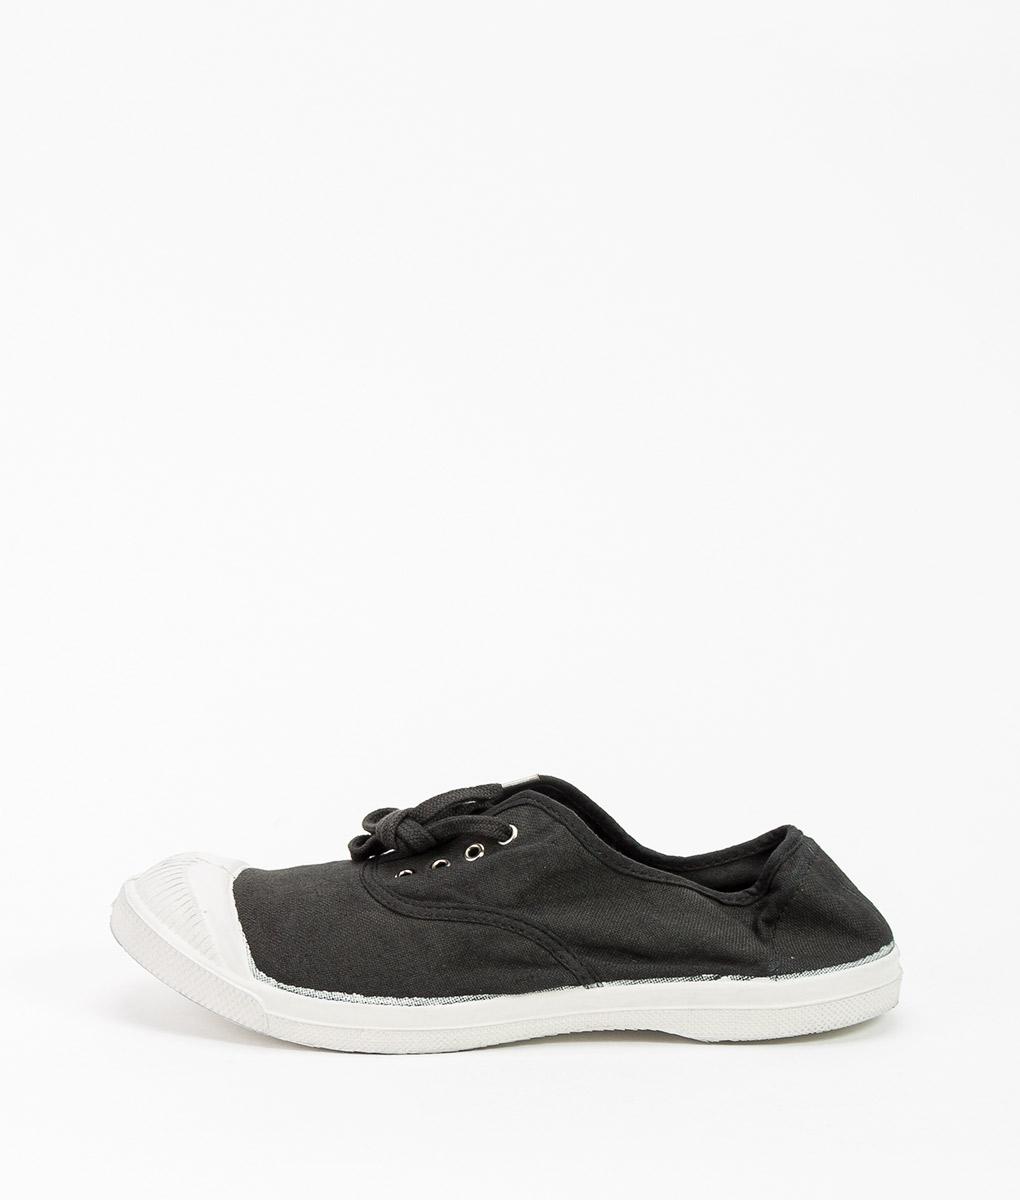 BENSIMON Women Sneakers 835 LACET Carbone 34.99 1